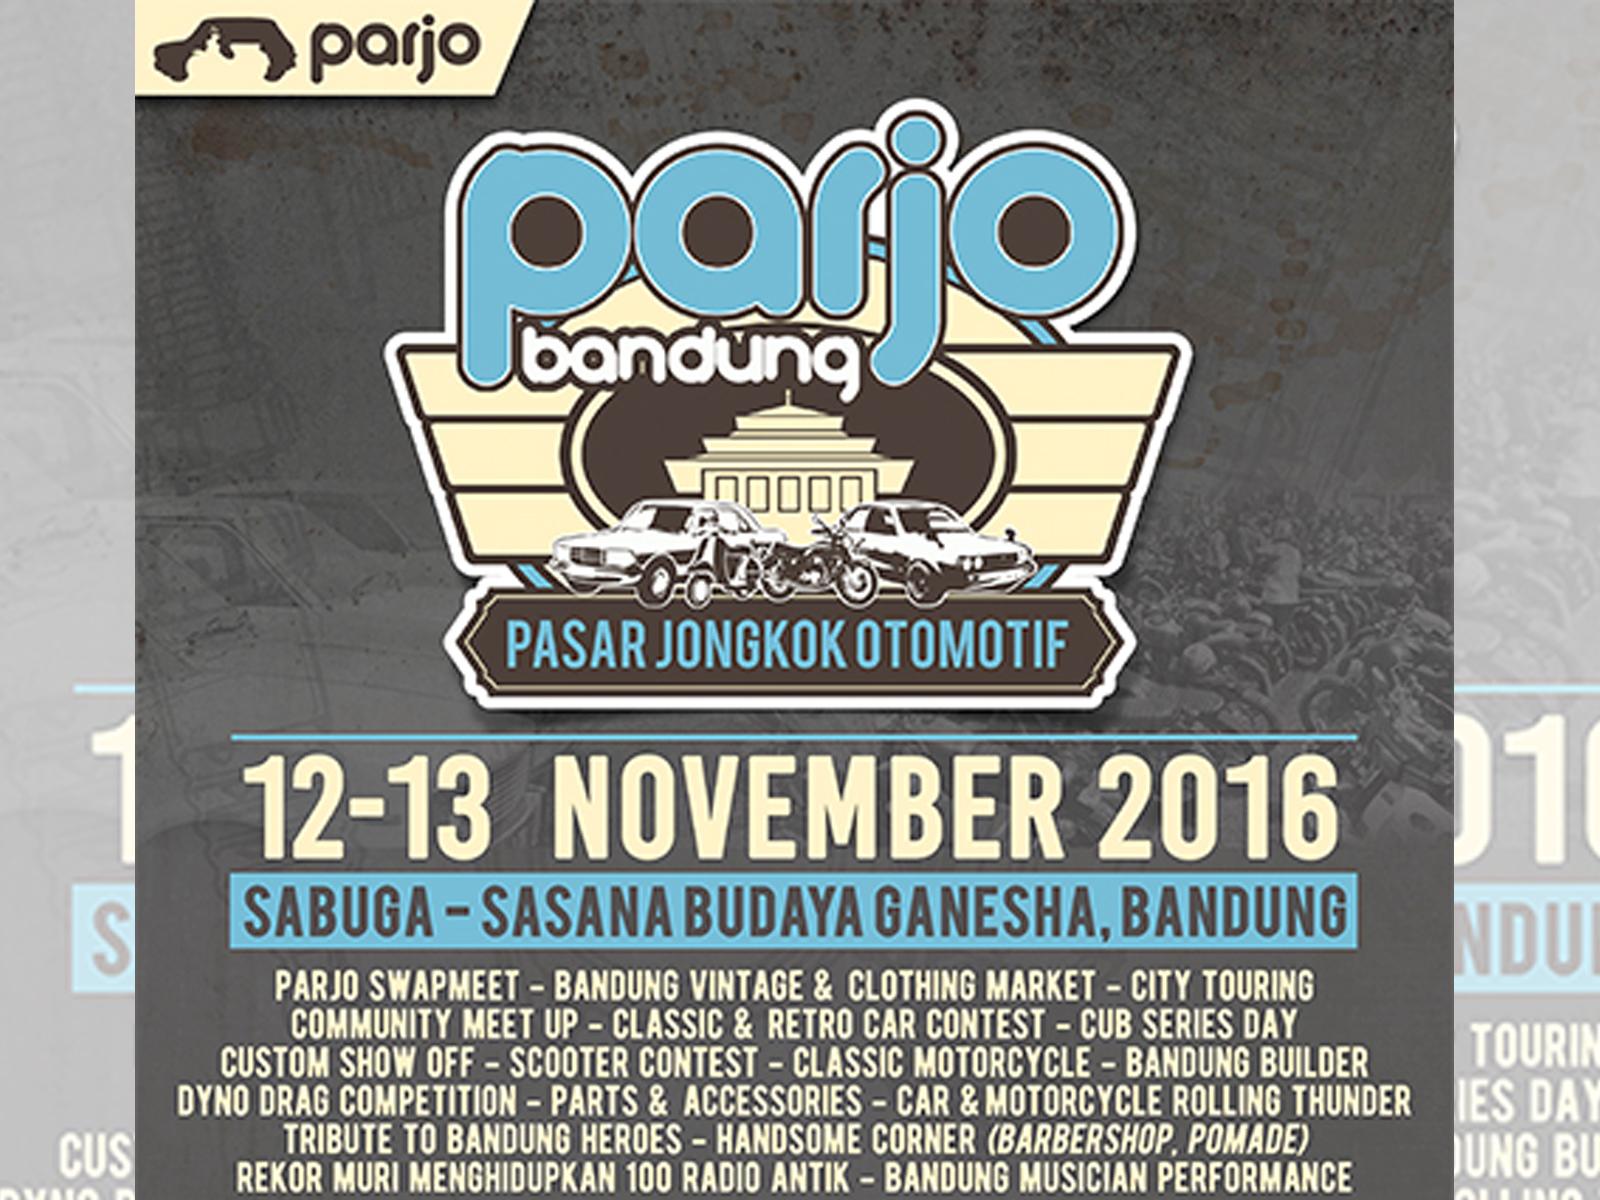 Parjo Pasar Jongkok Otomotif 2016 Bandung